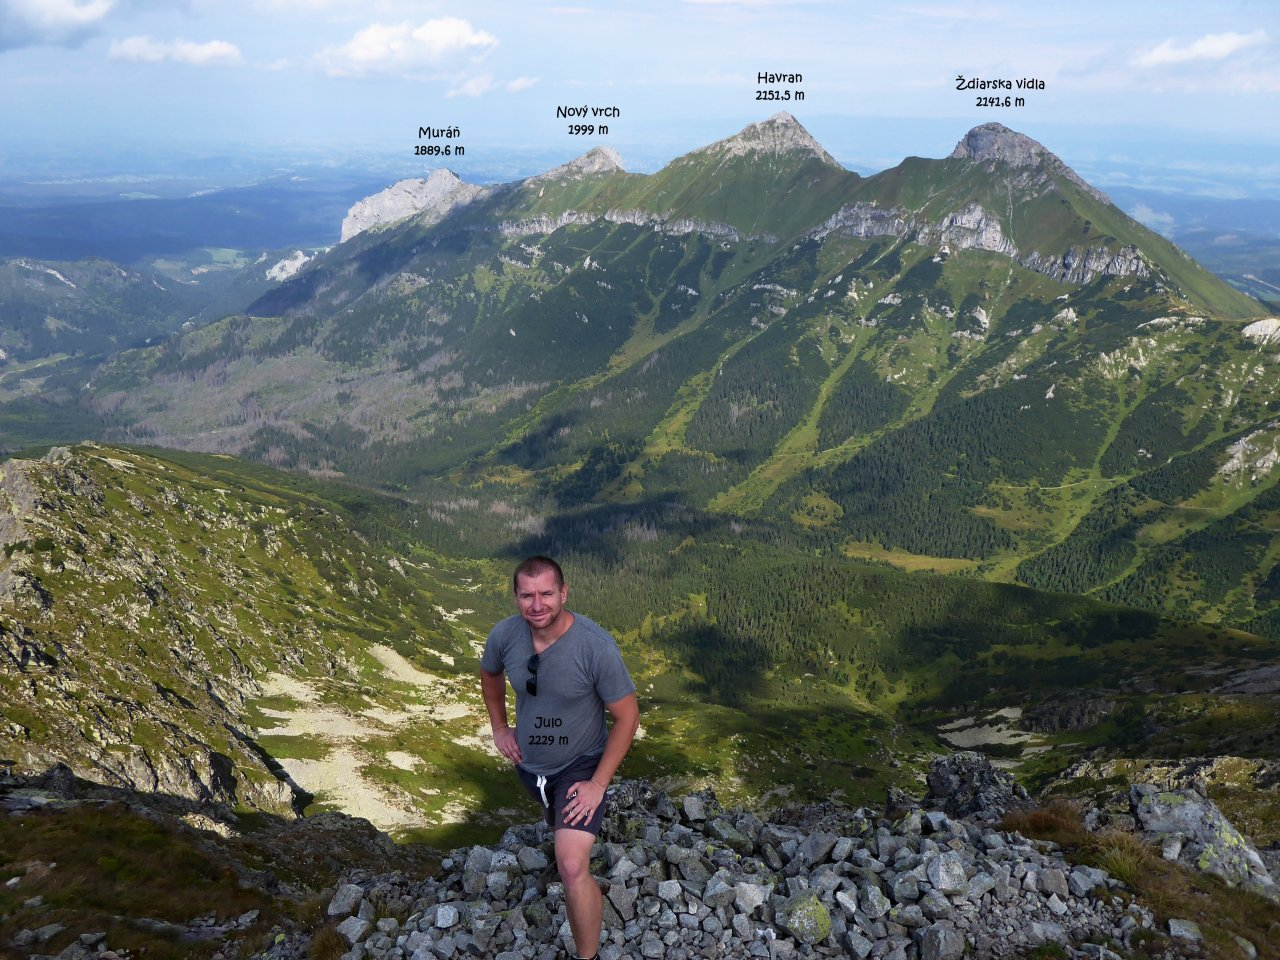 Jahňací štít, Tatra mountains, Slovakia